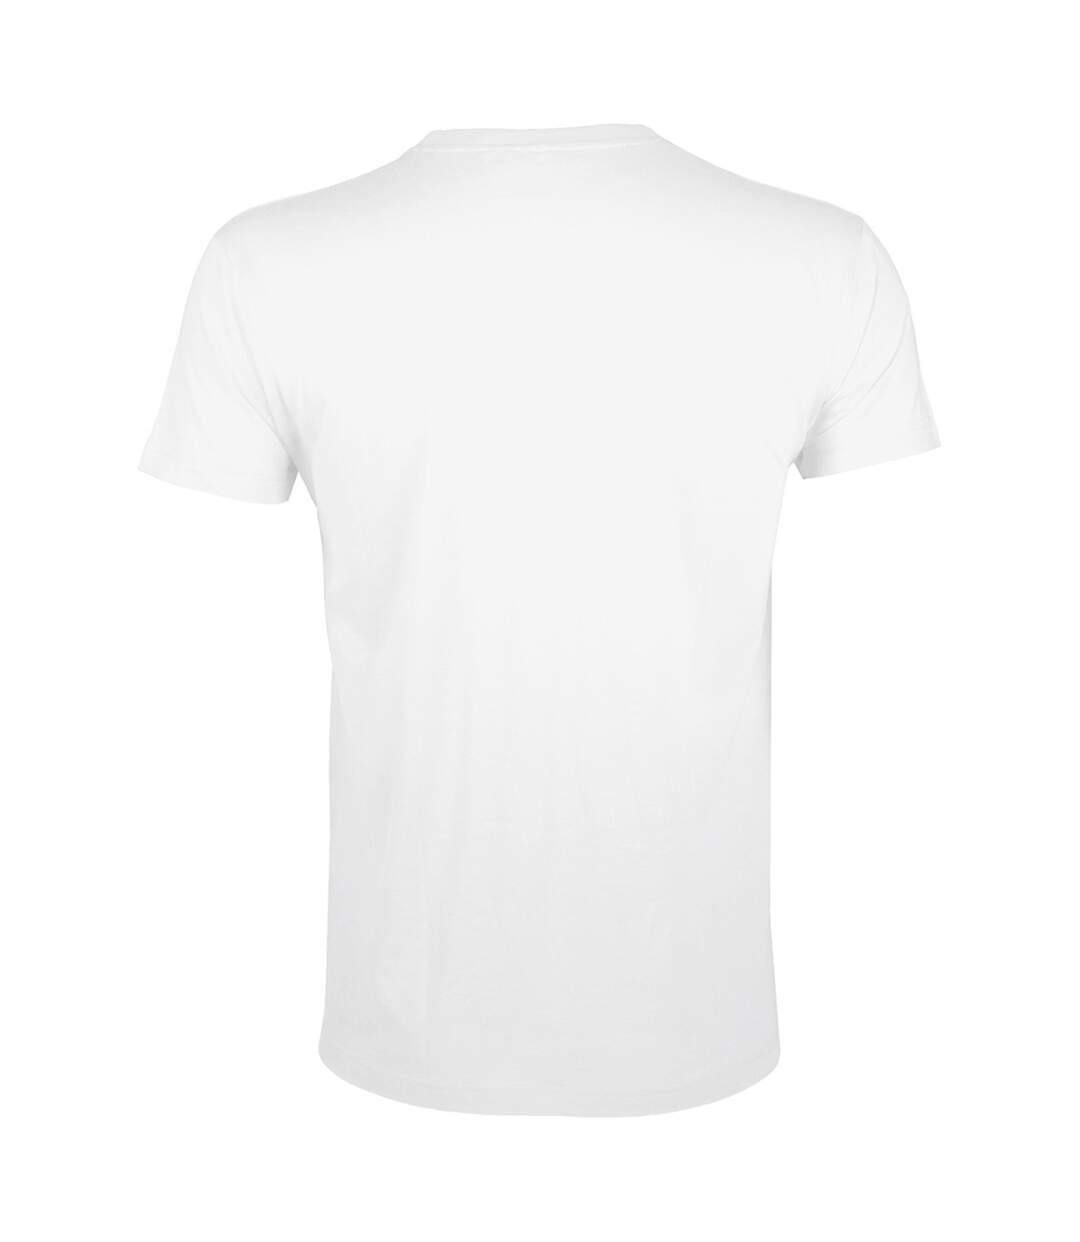 SOLS - T-shirt REGENT - Homme (Blanc) - UTPC506